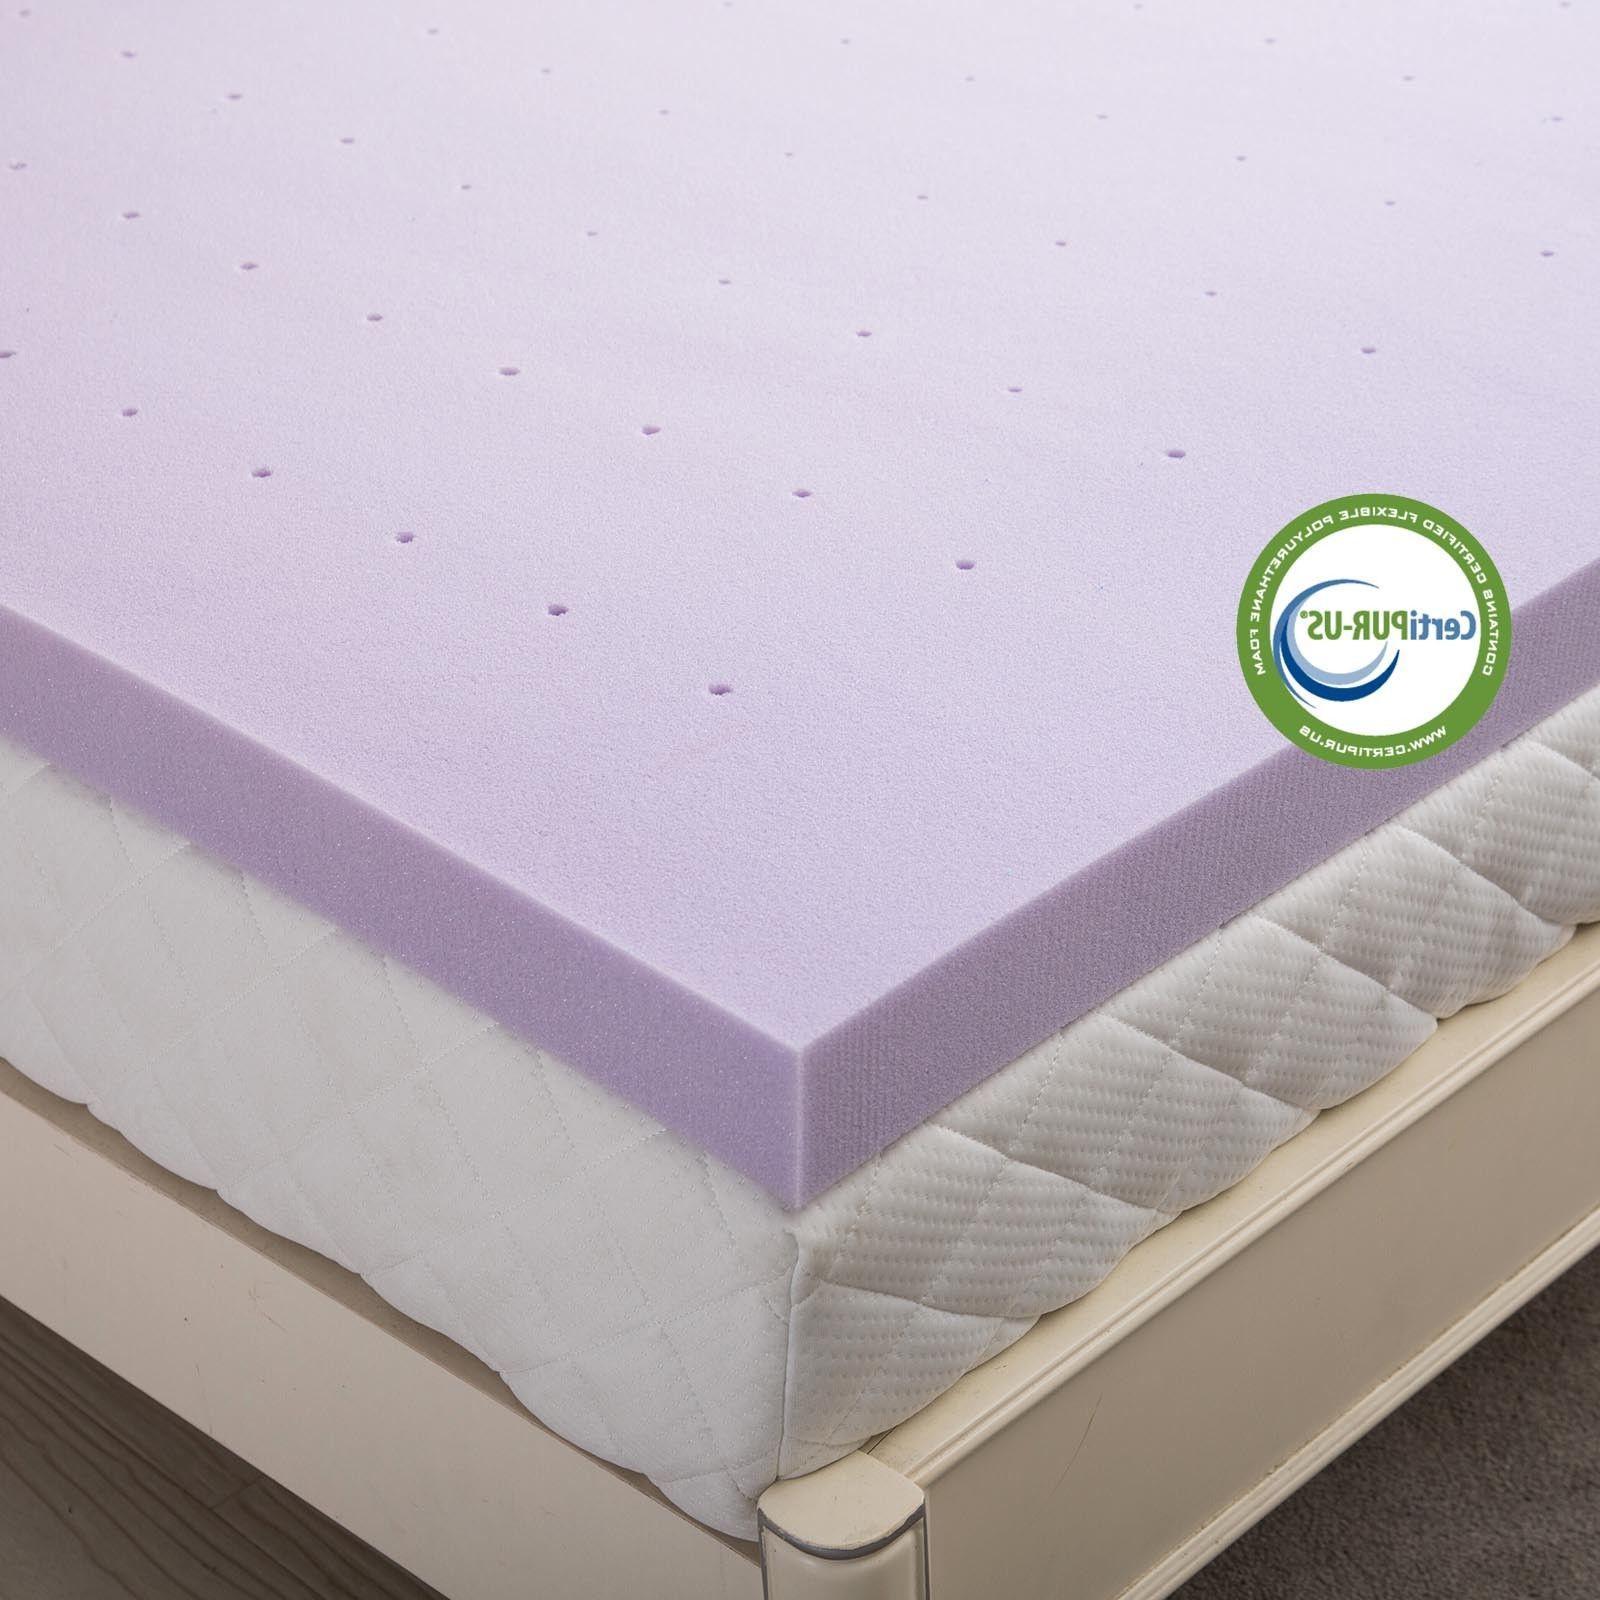 Lavender 3 Inch Memory Foam Full